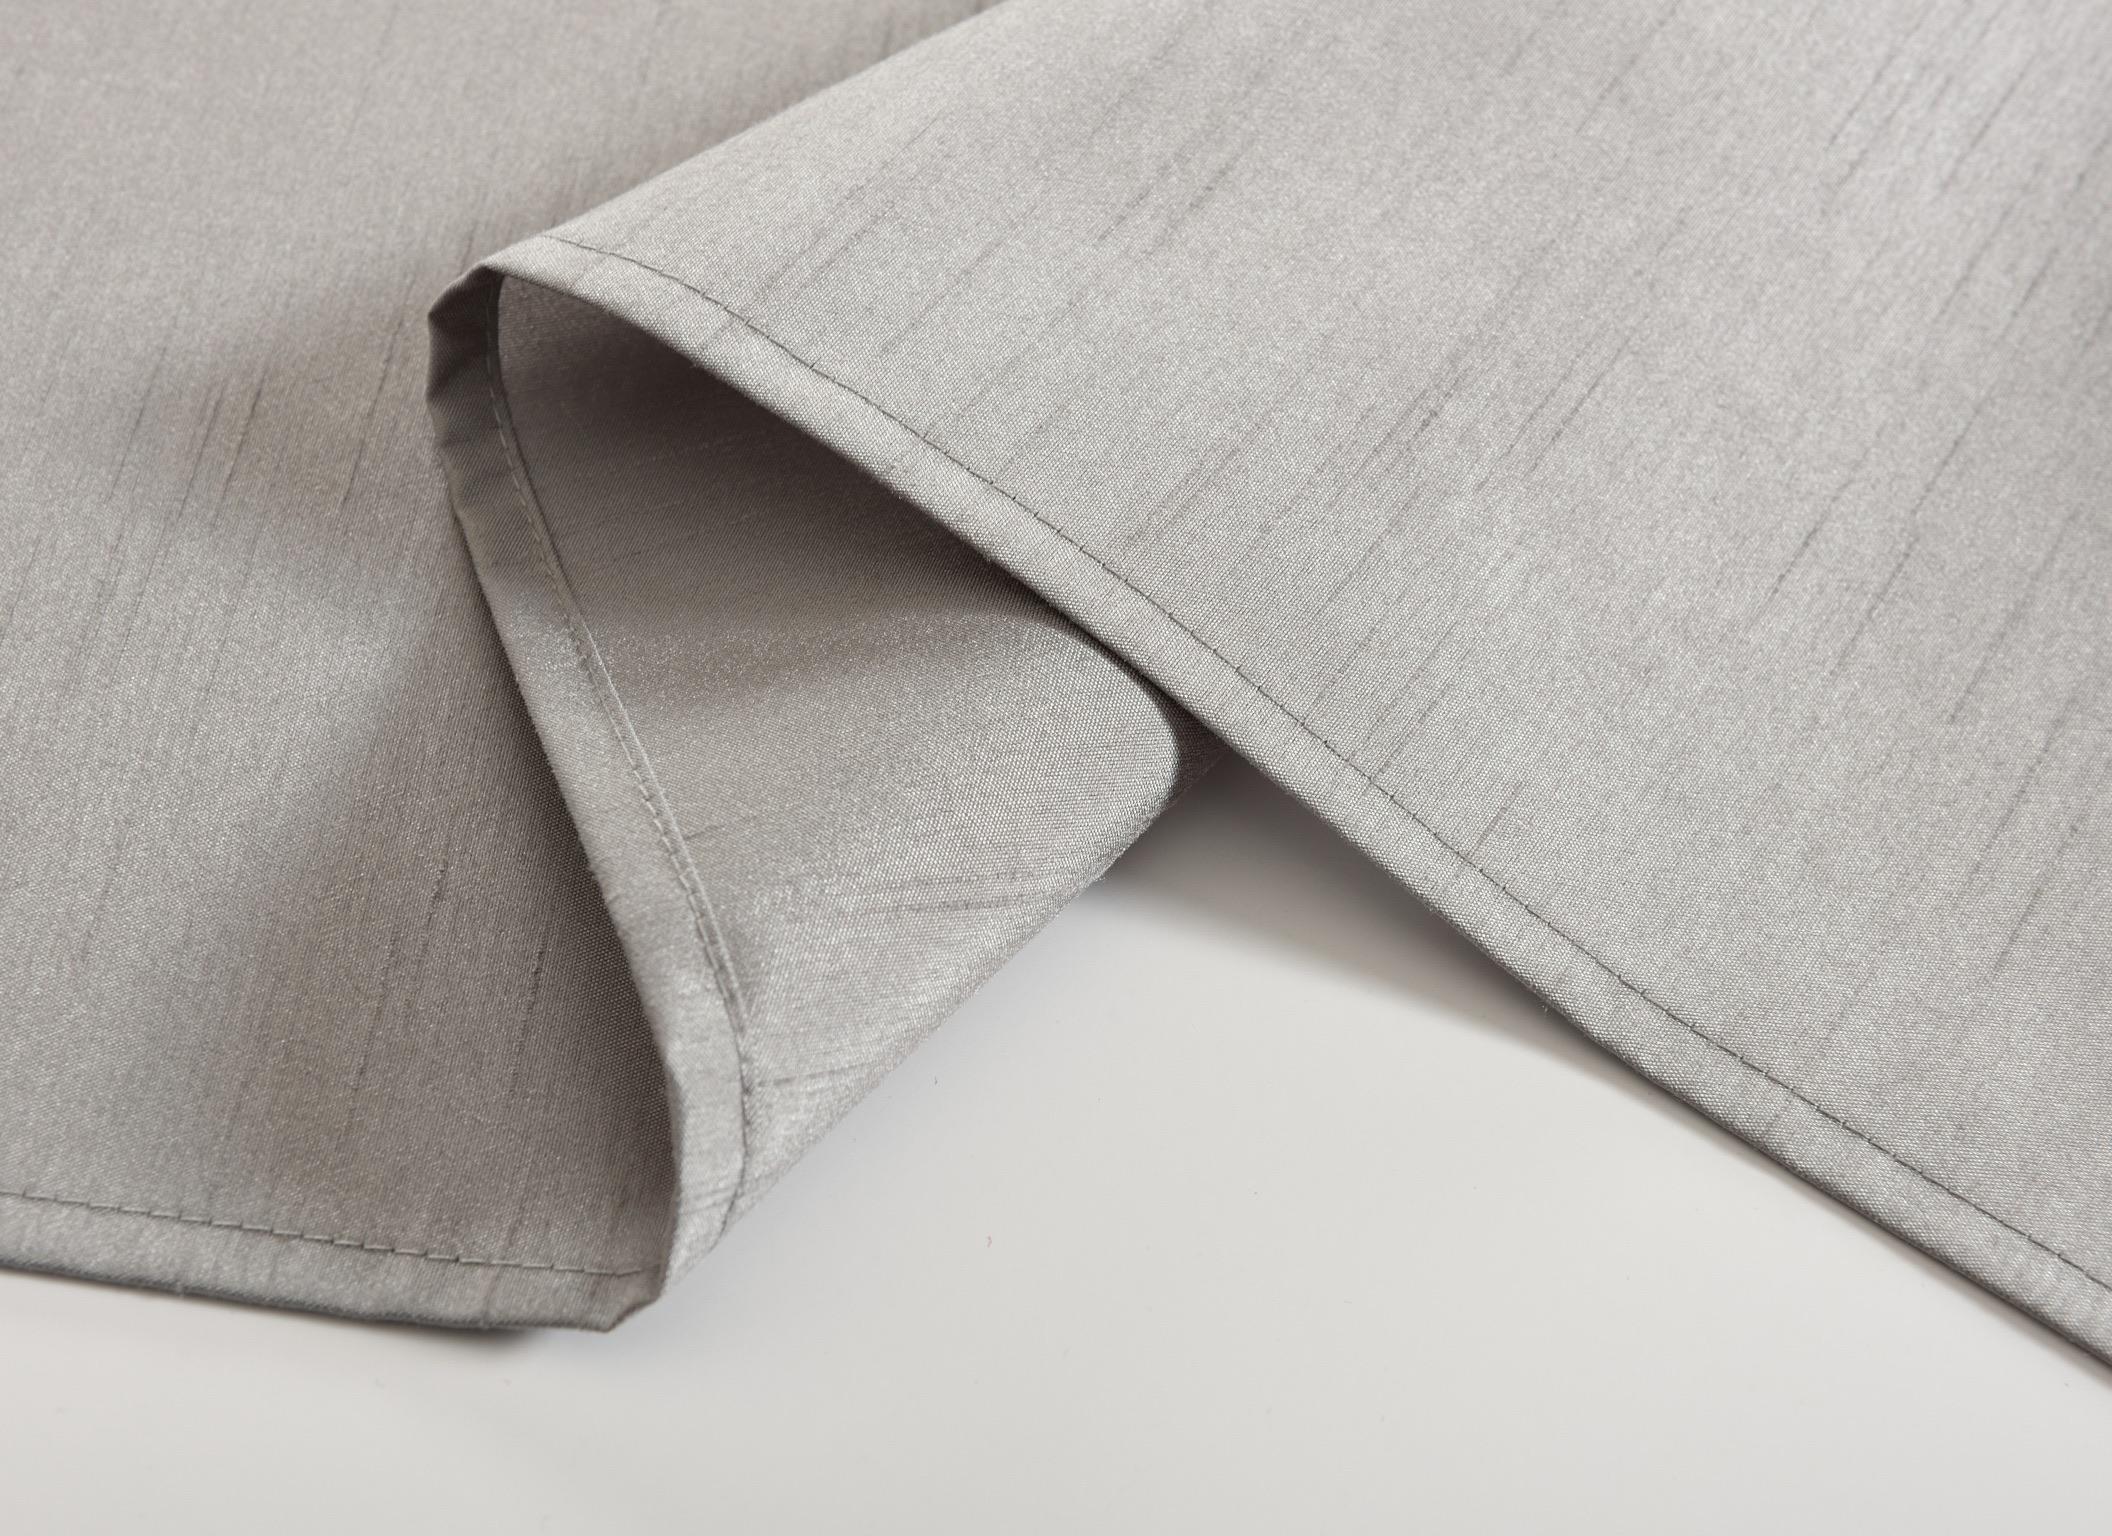 schiebegardine fl chenvorhang wildseide optik vorhang. Black Bedroom Furniture Sets. Home Design Ideas